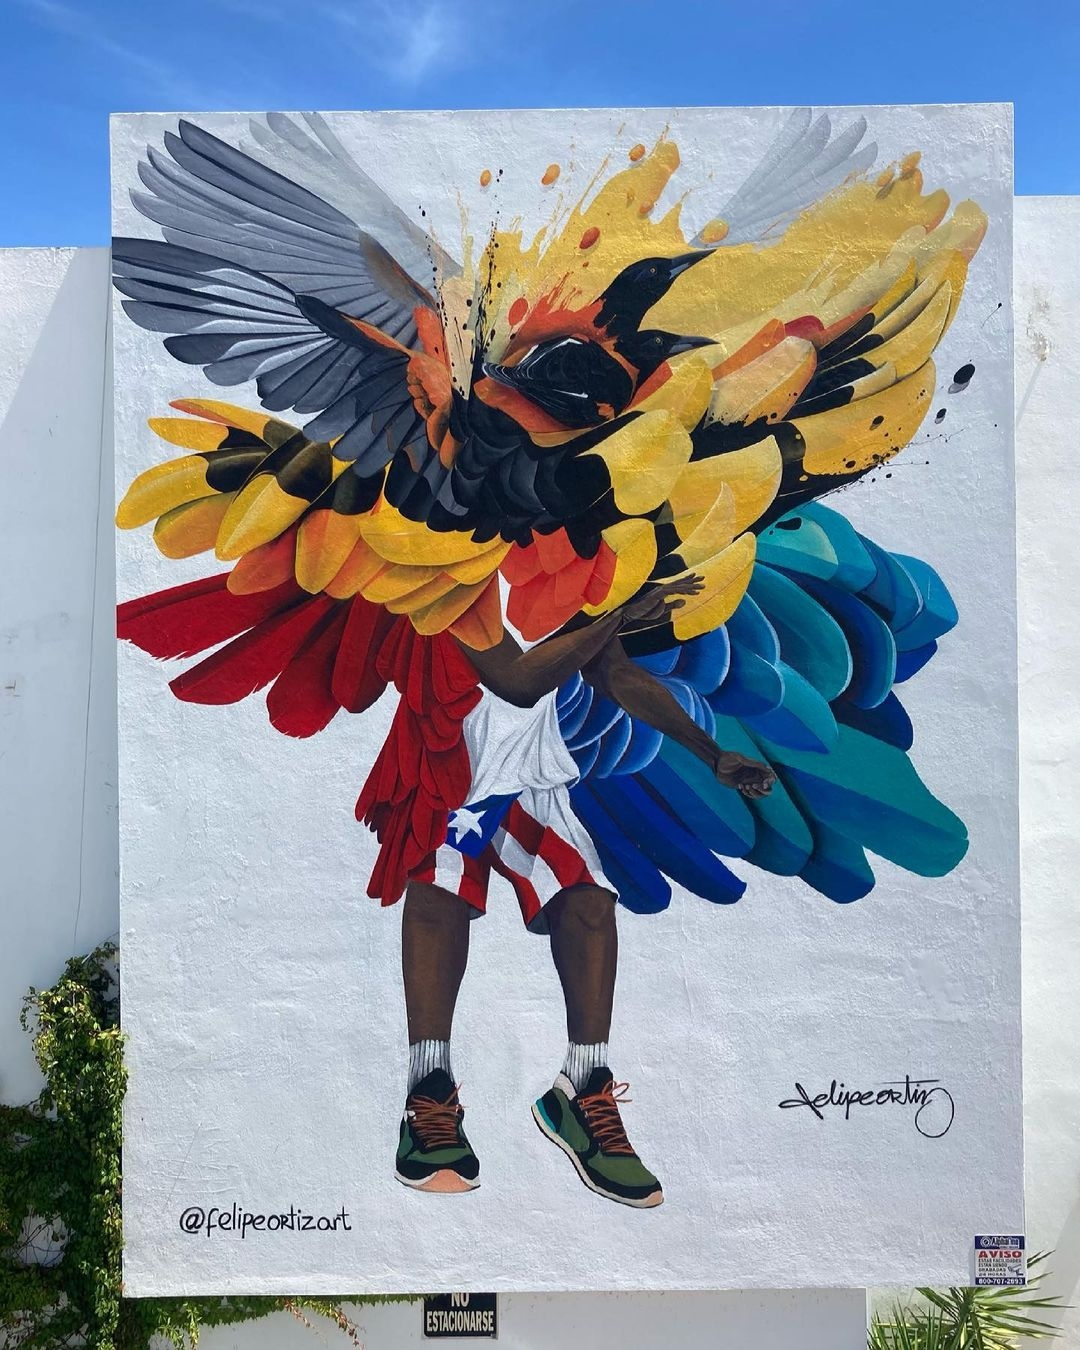 Felipe Ortiz @ San Juan, Puerto Rico